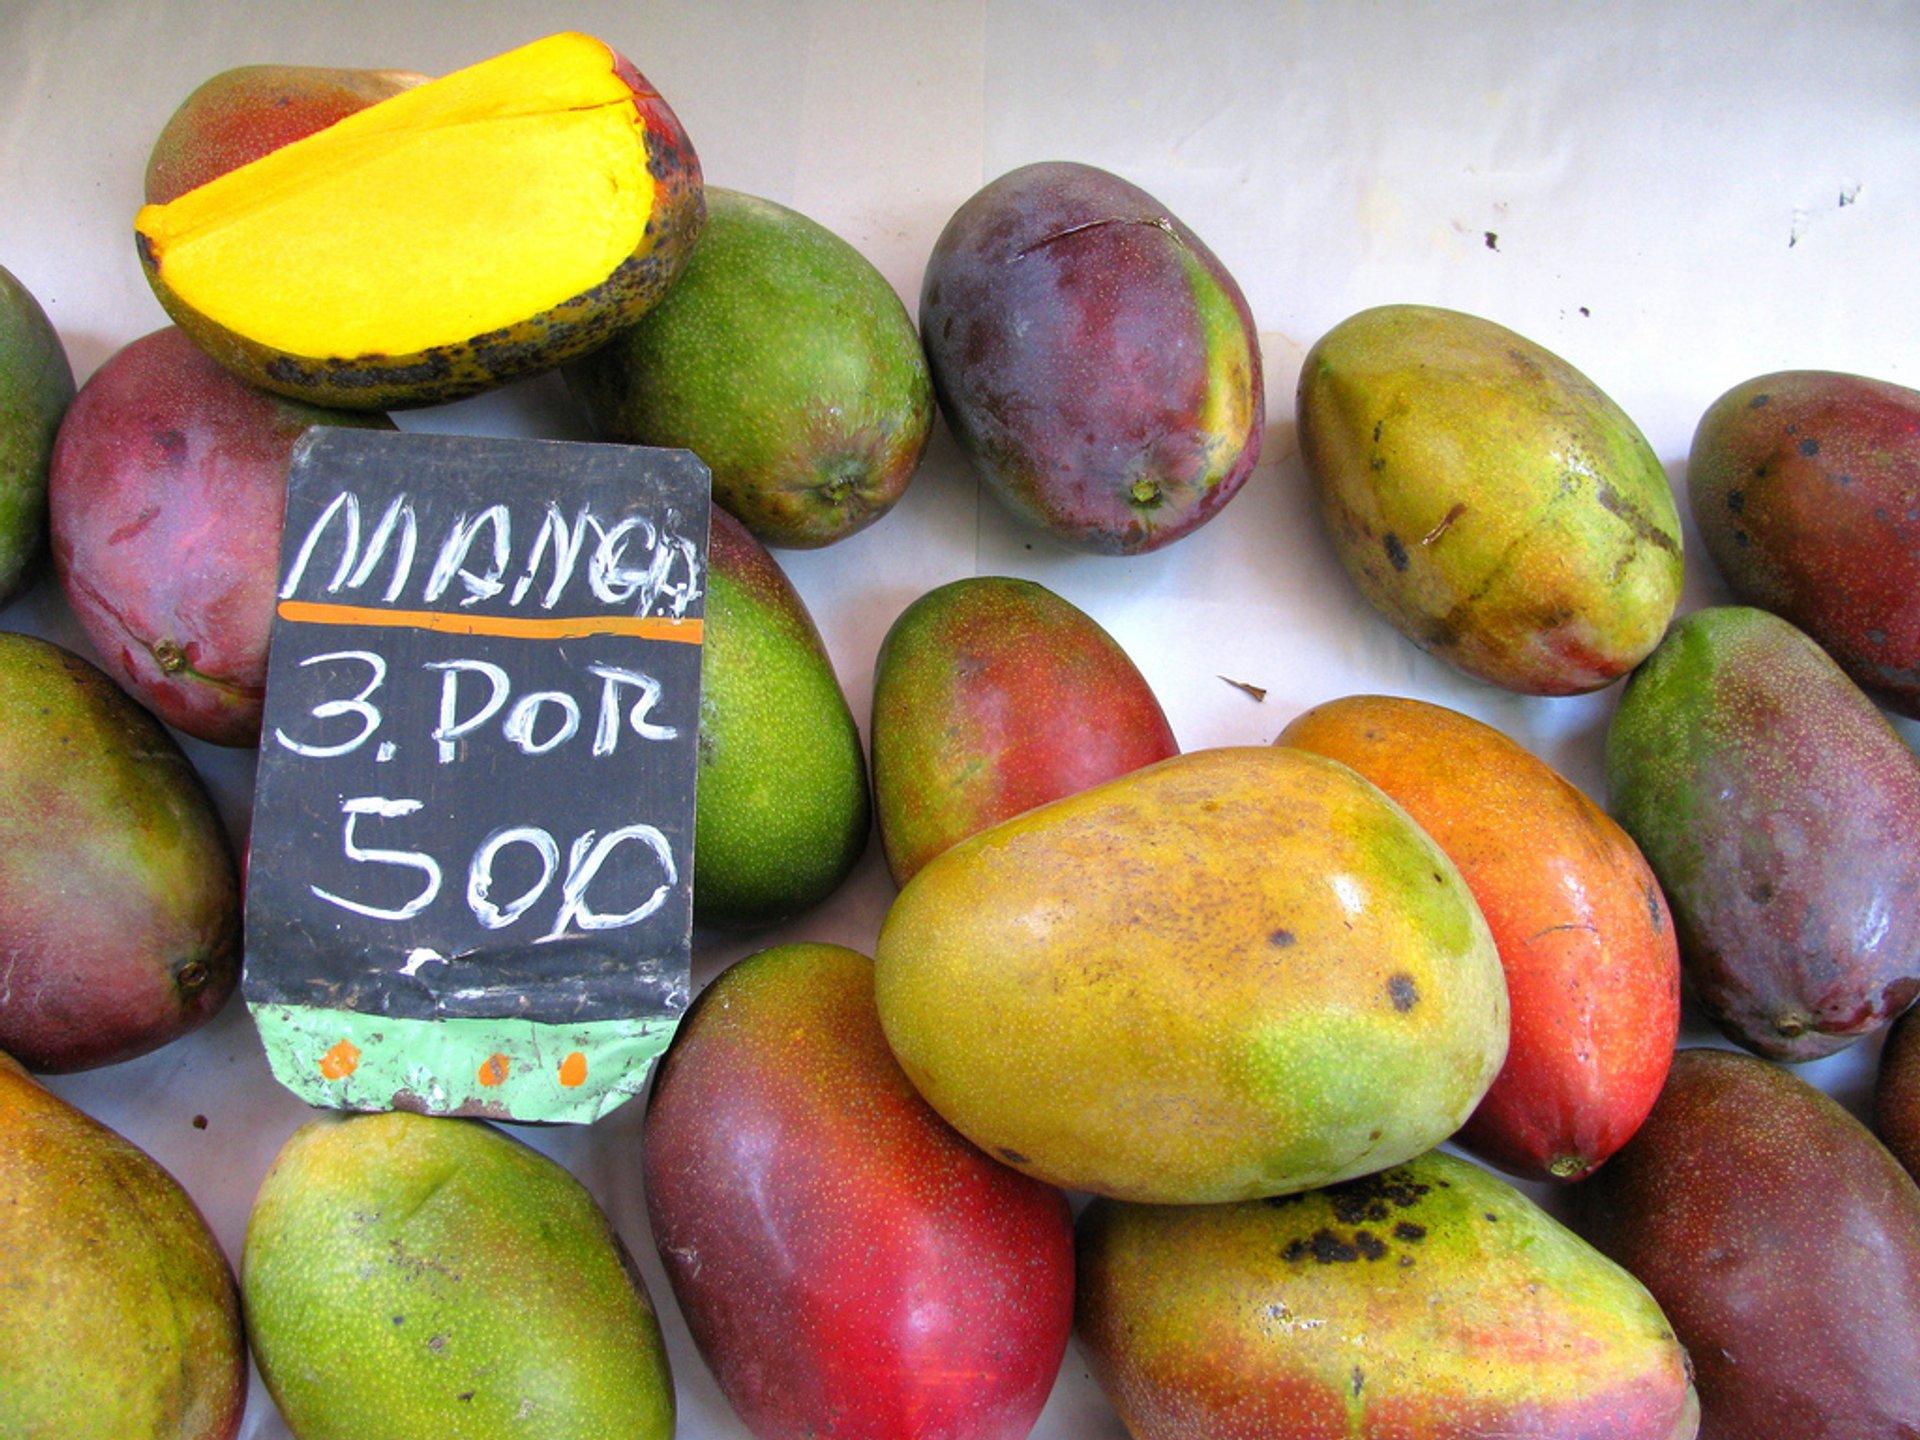 Mango in Rio de Janeiro 2020 - Best Time